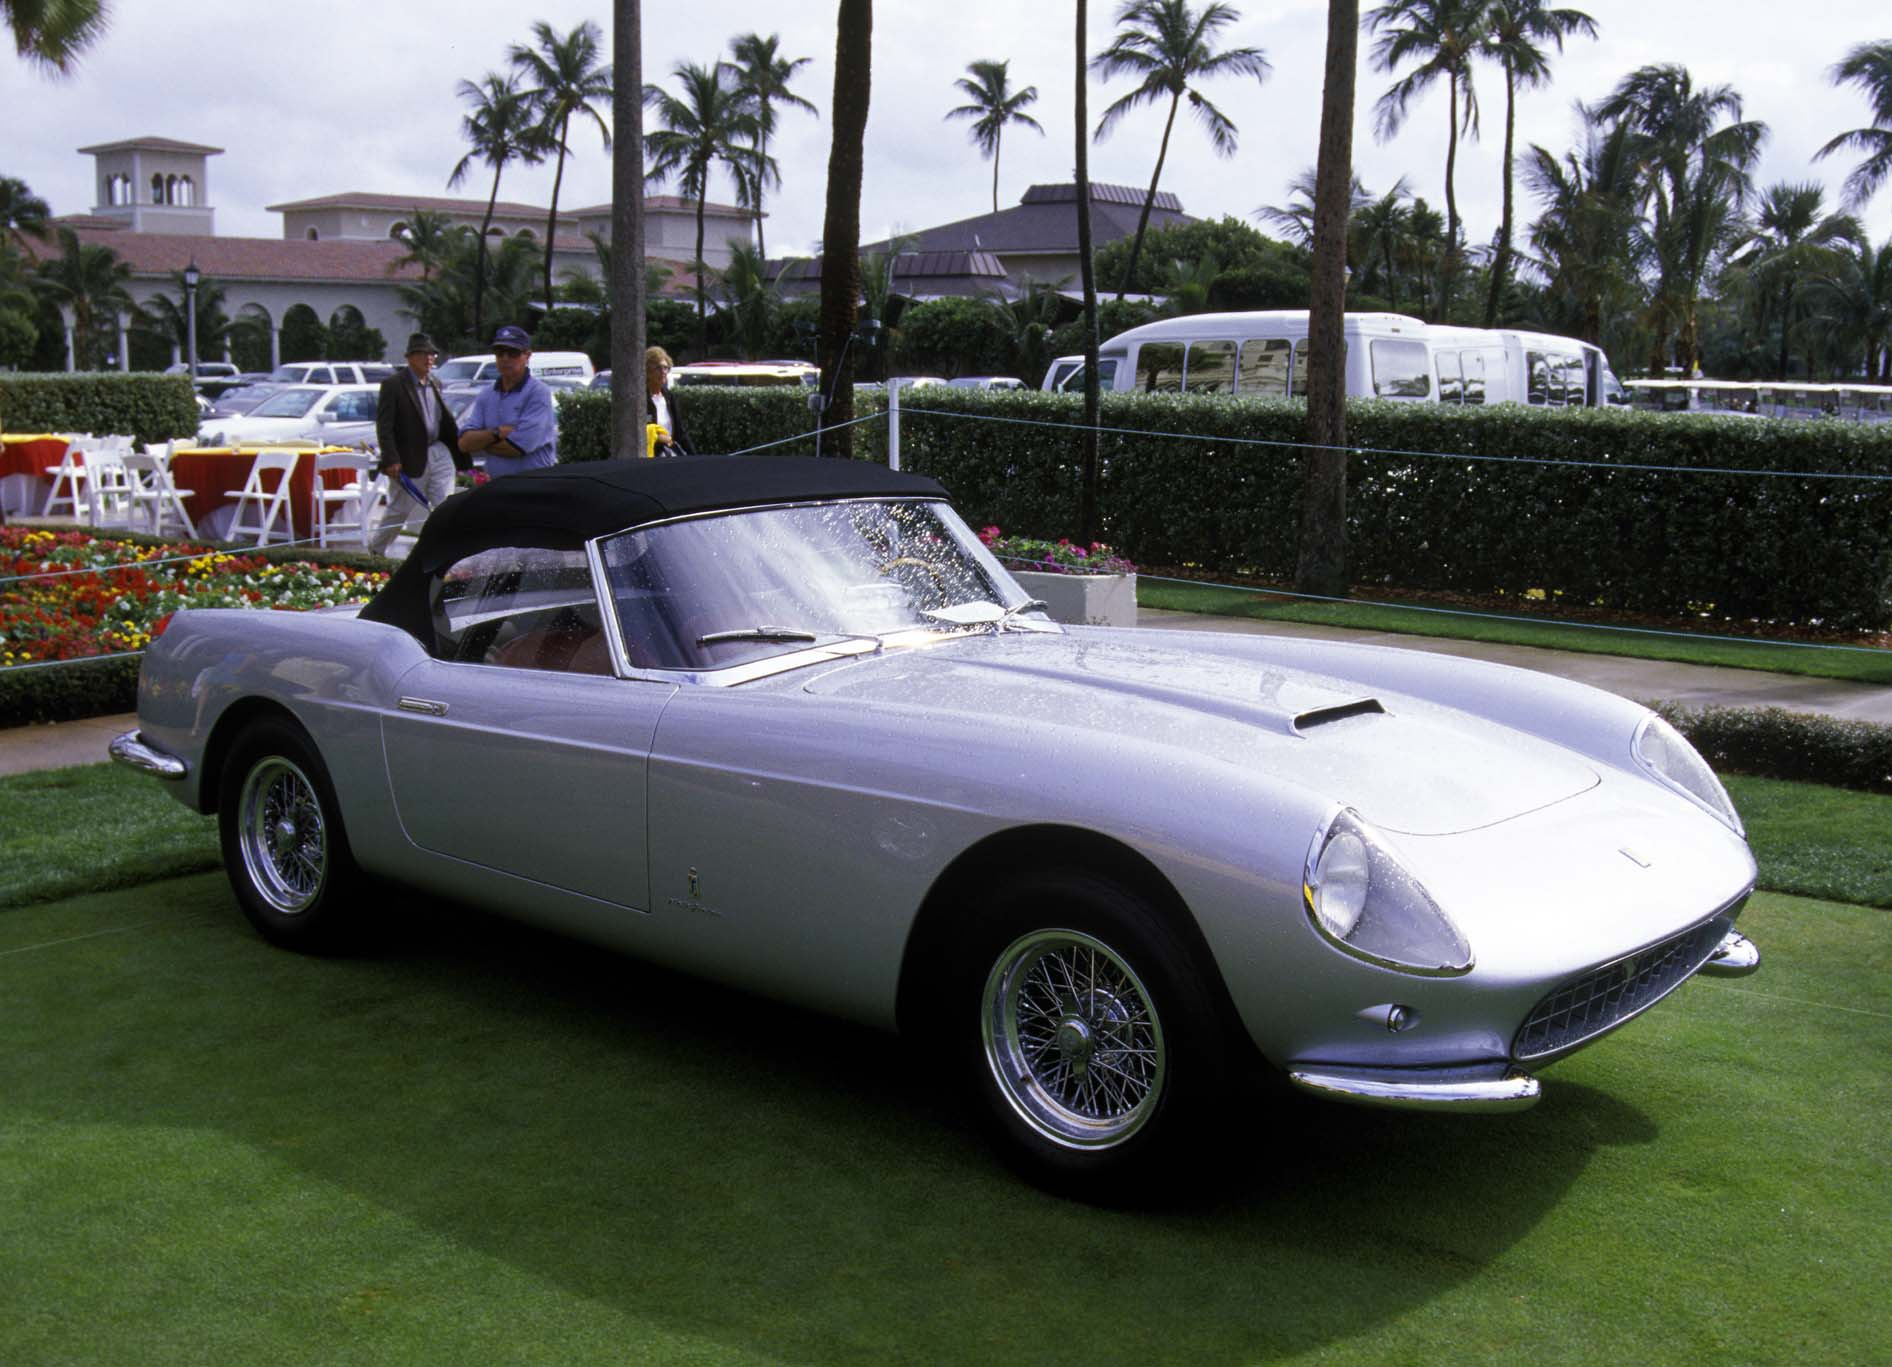 Pic4Year2001 stolen Ferrari VIN 0799GT